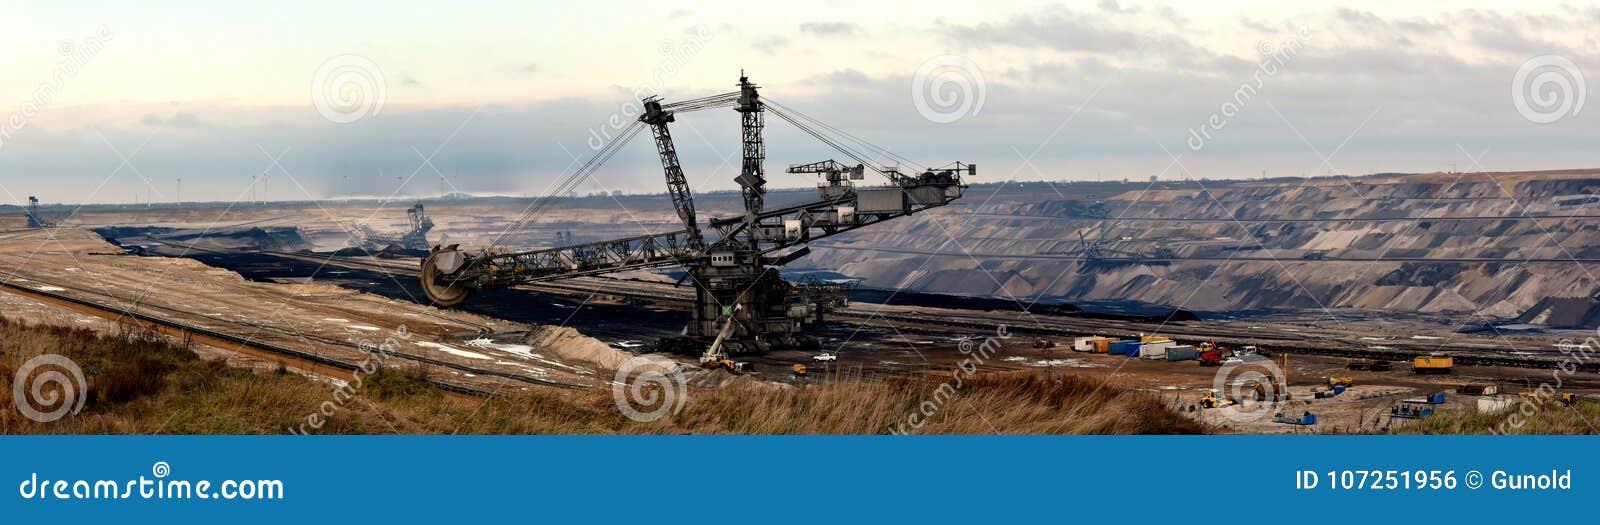 Panoramic view of opencast mining in my neighborhood